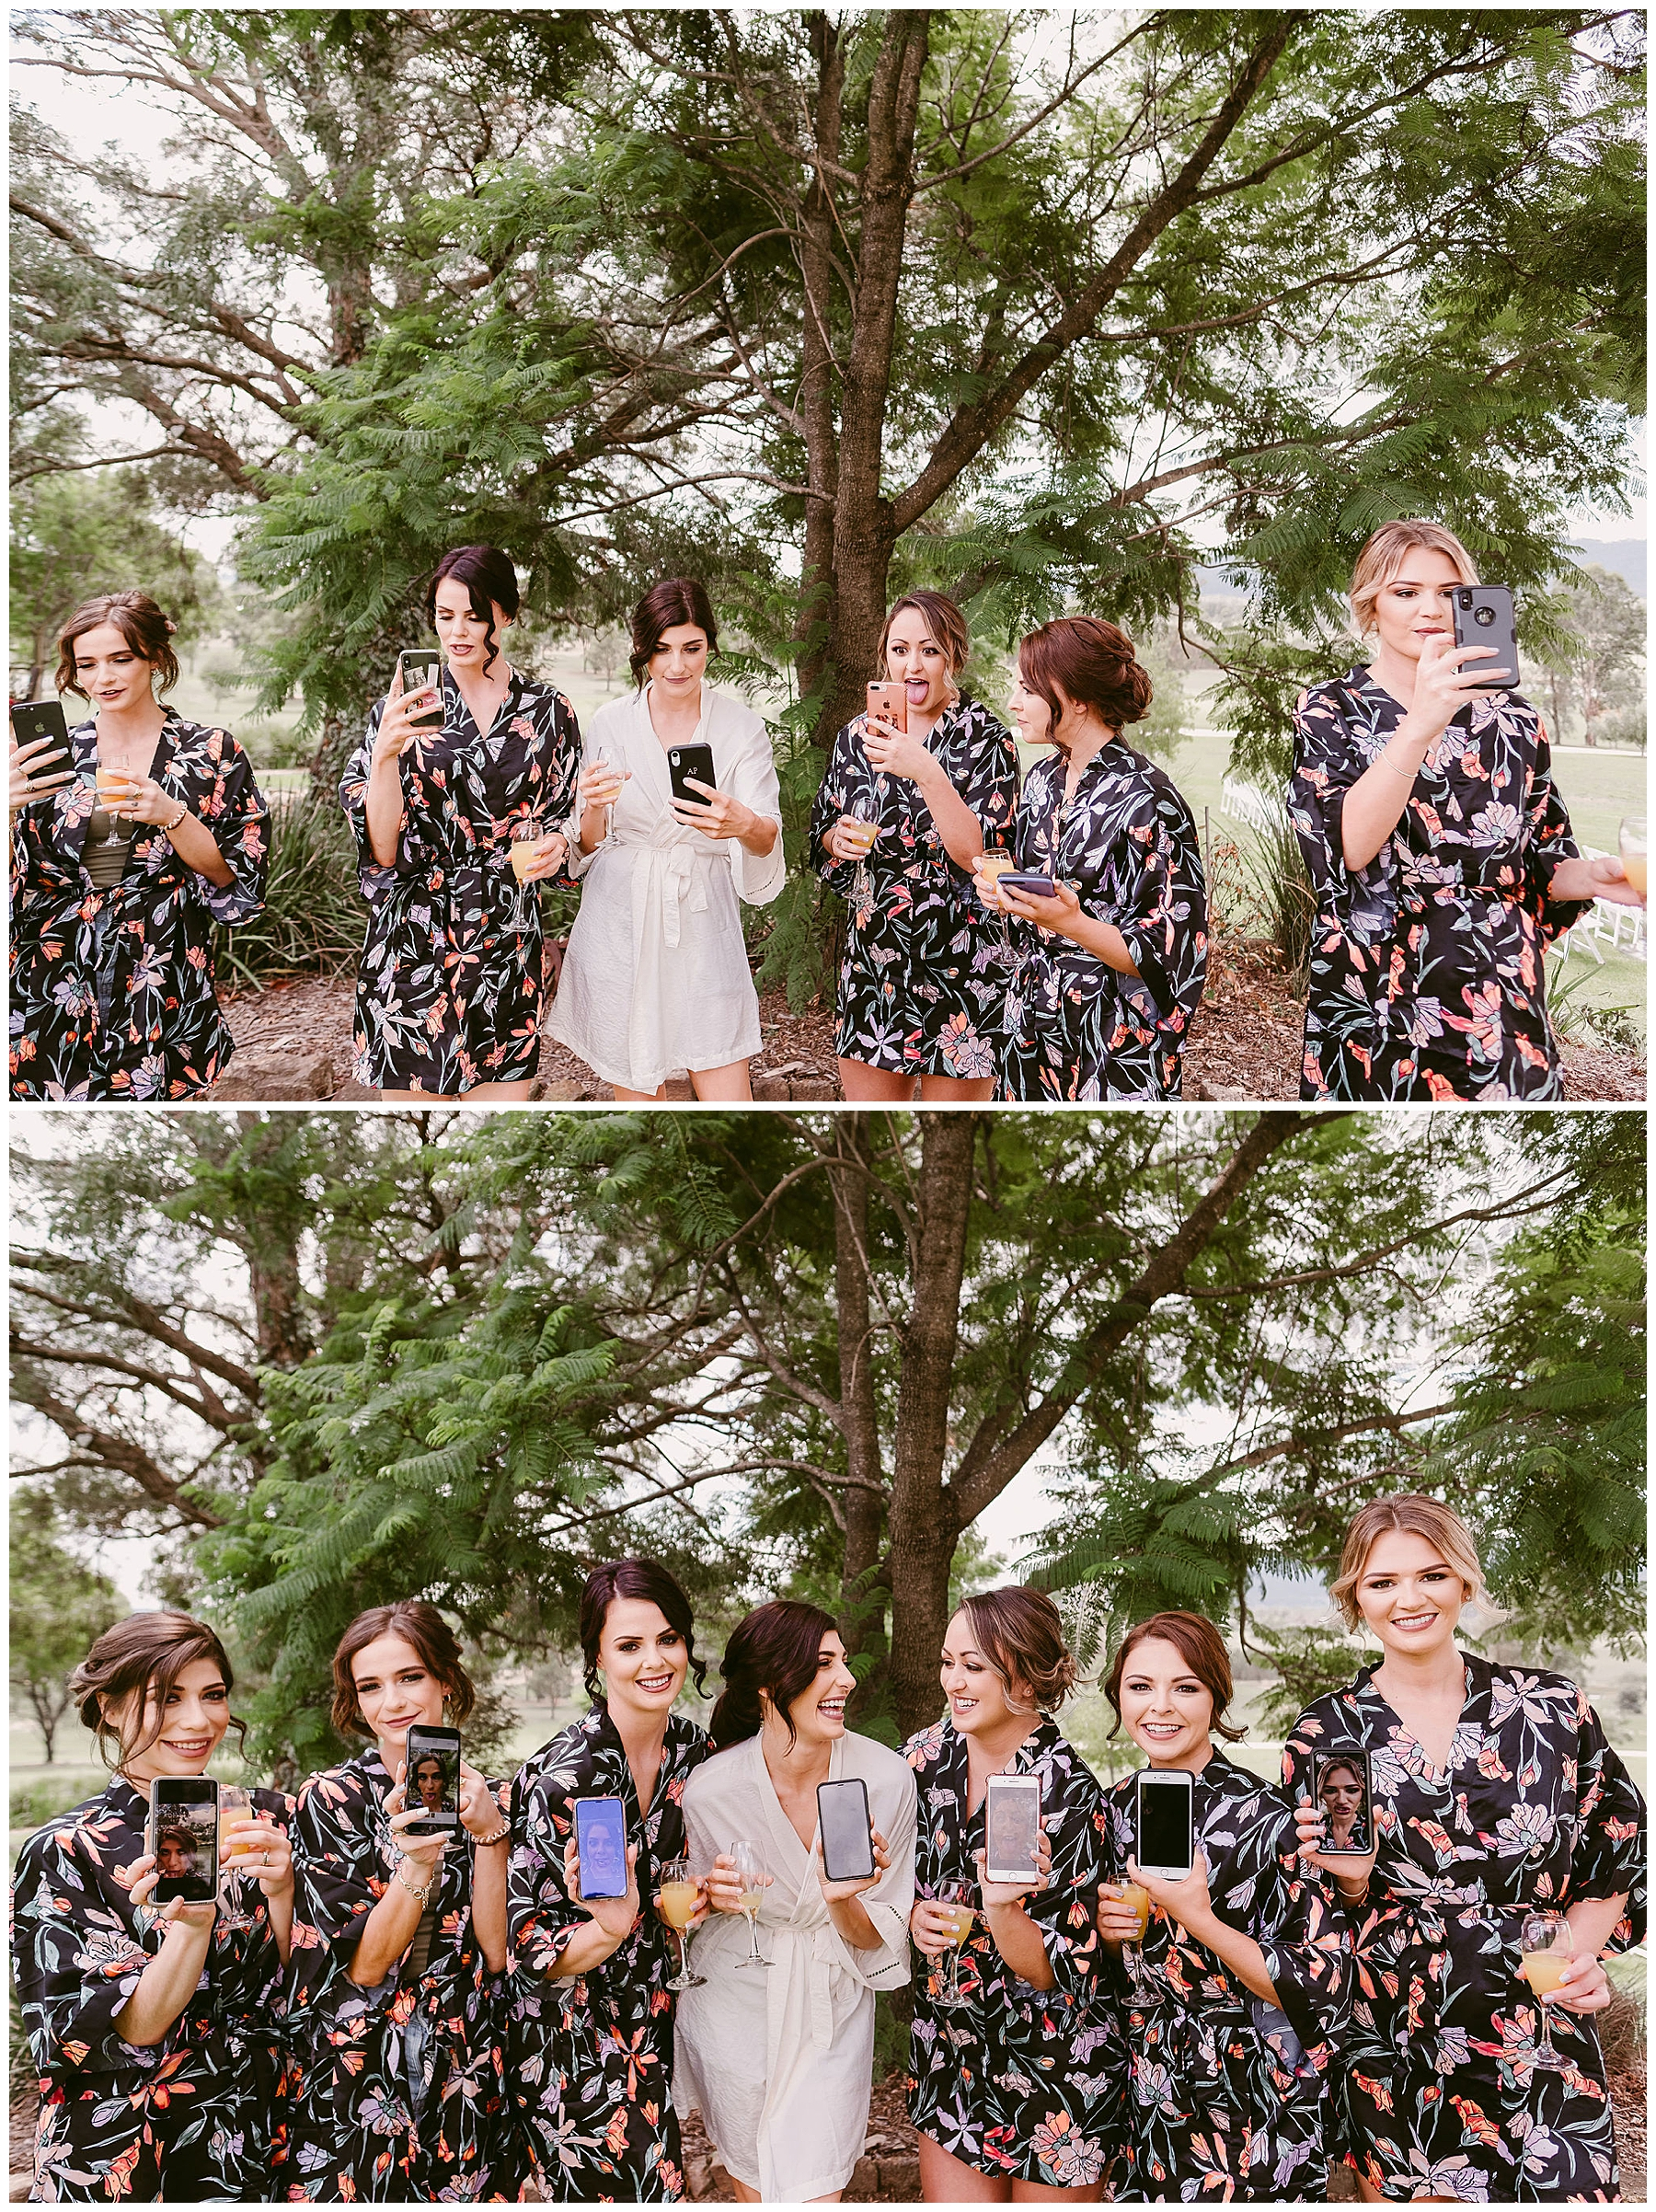 Adam's Peak Wedding Photos + Popcorn Photography_0005.jpg